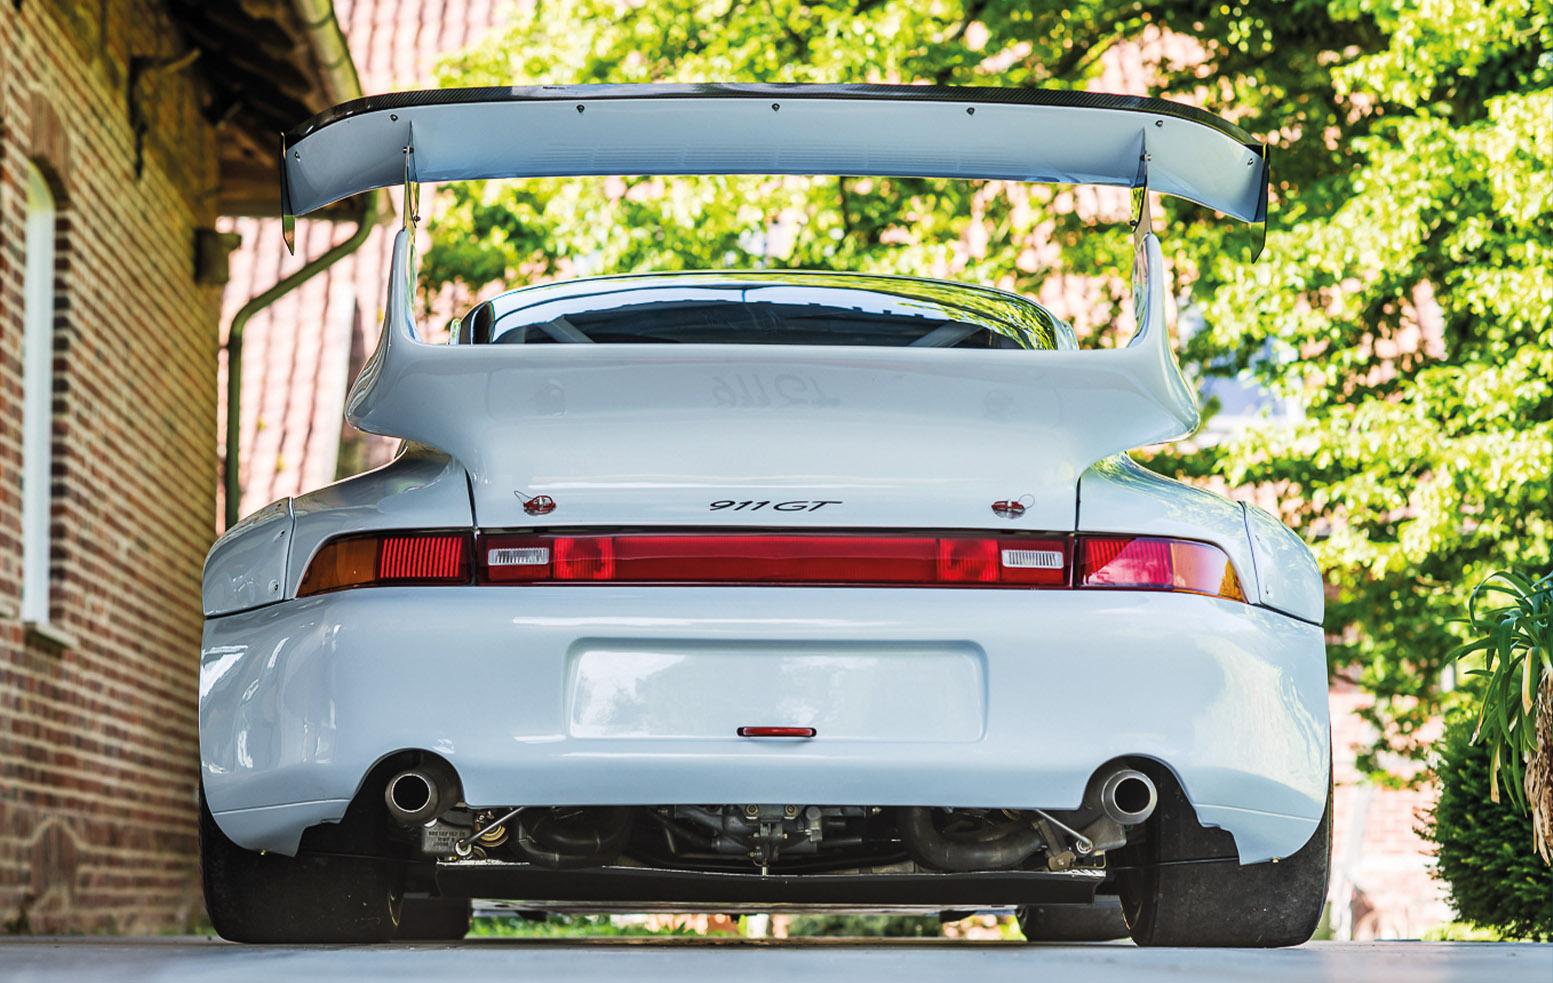 Porsche 911 993 GT2R rear wing